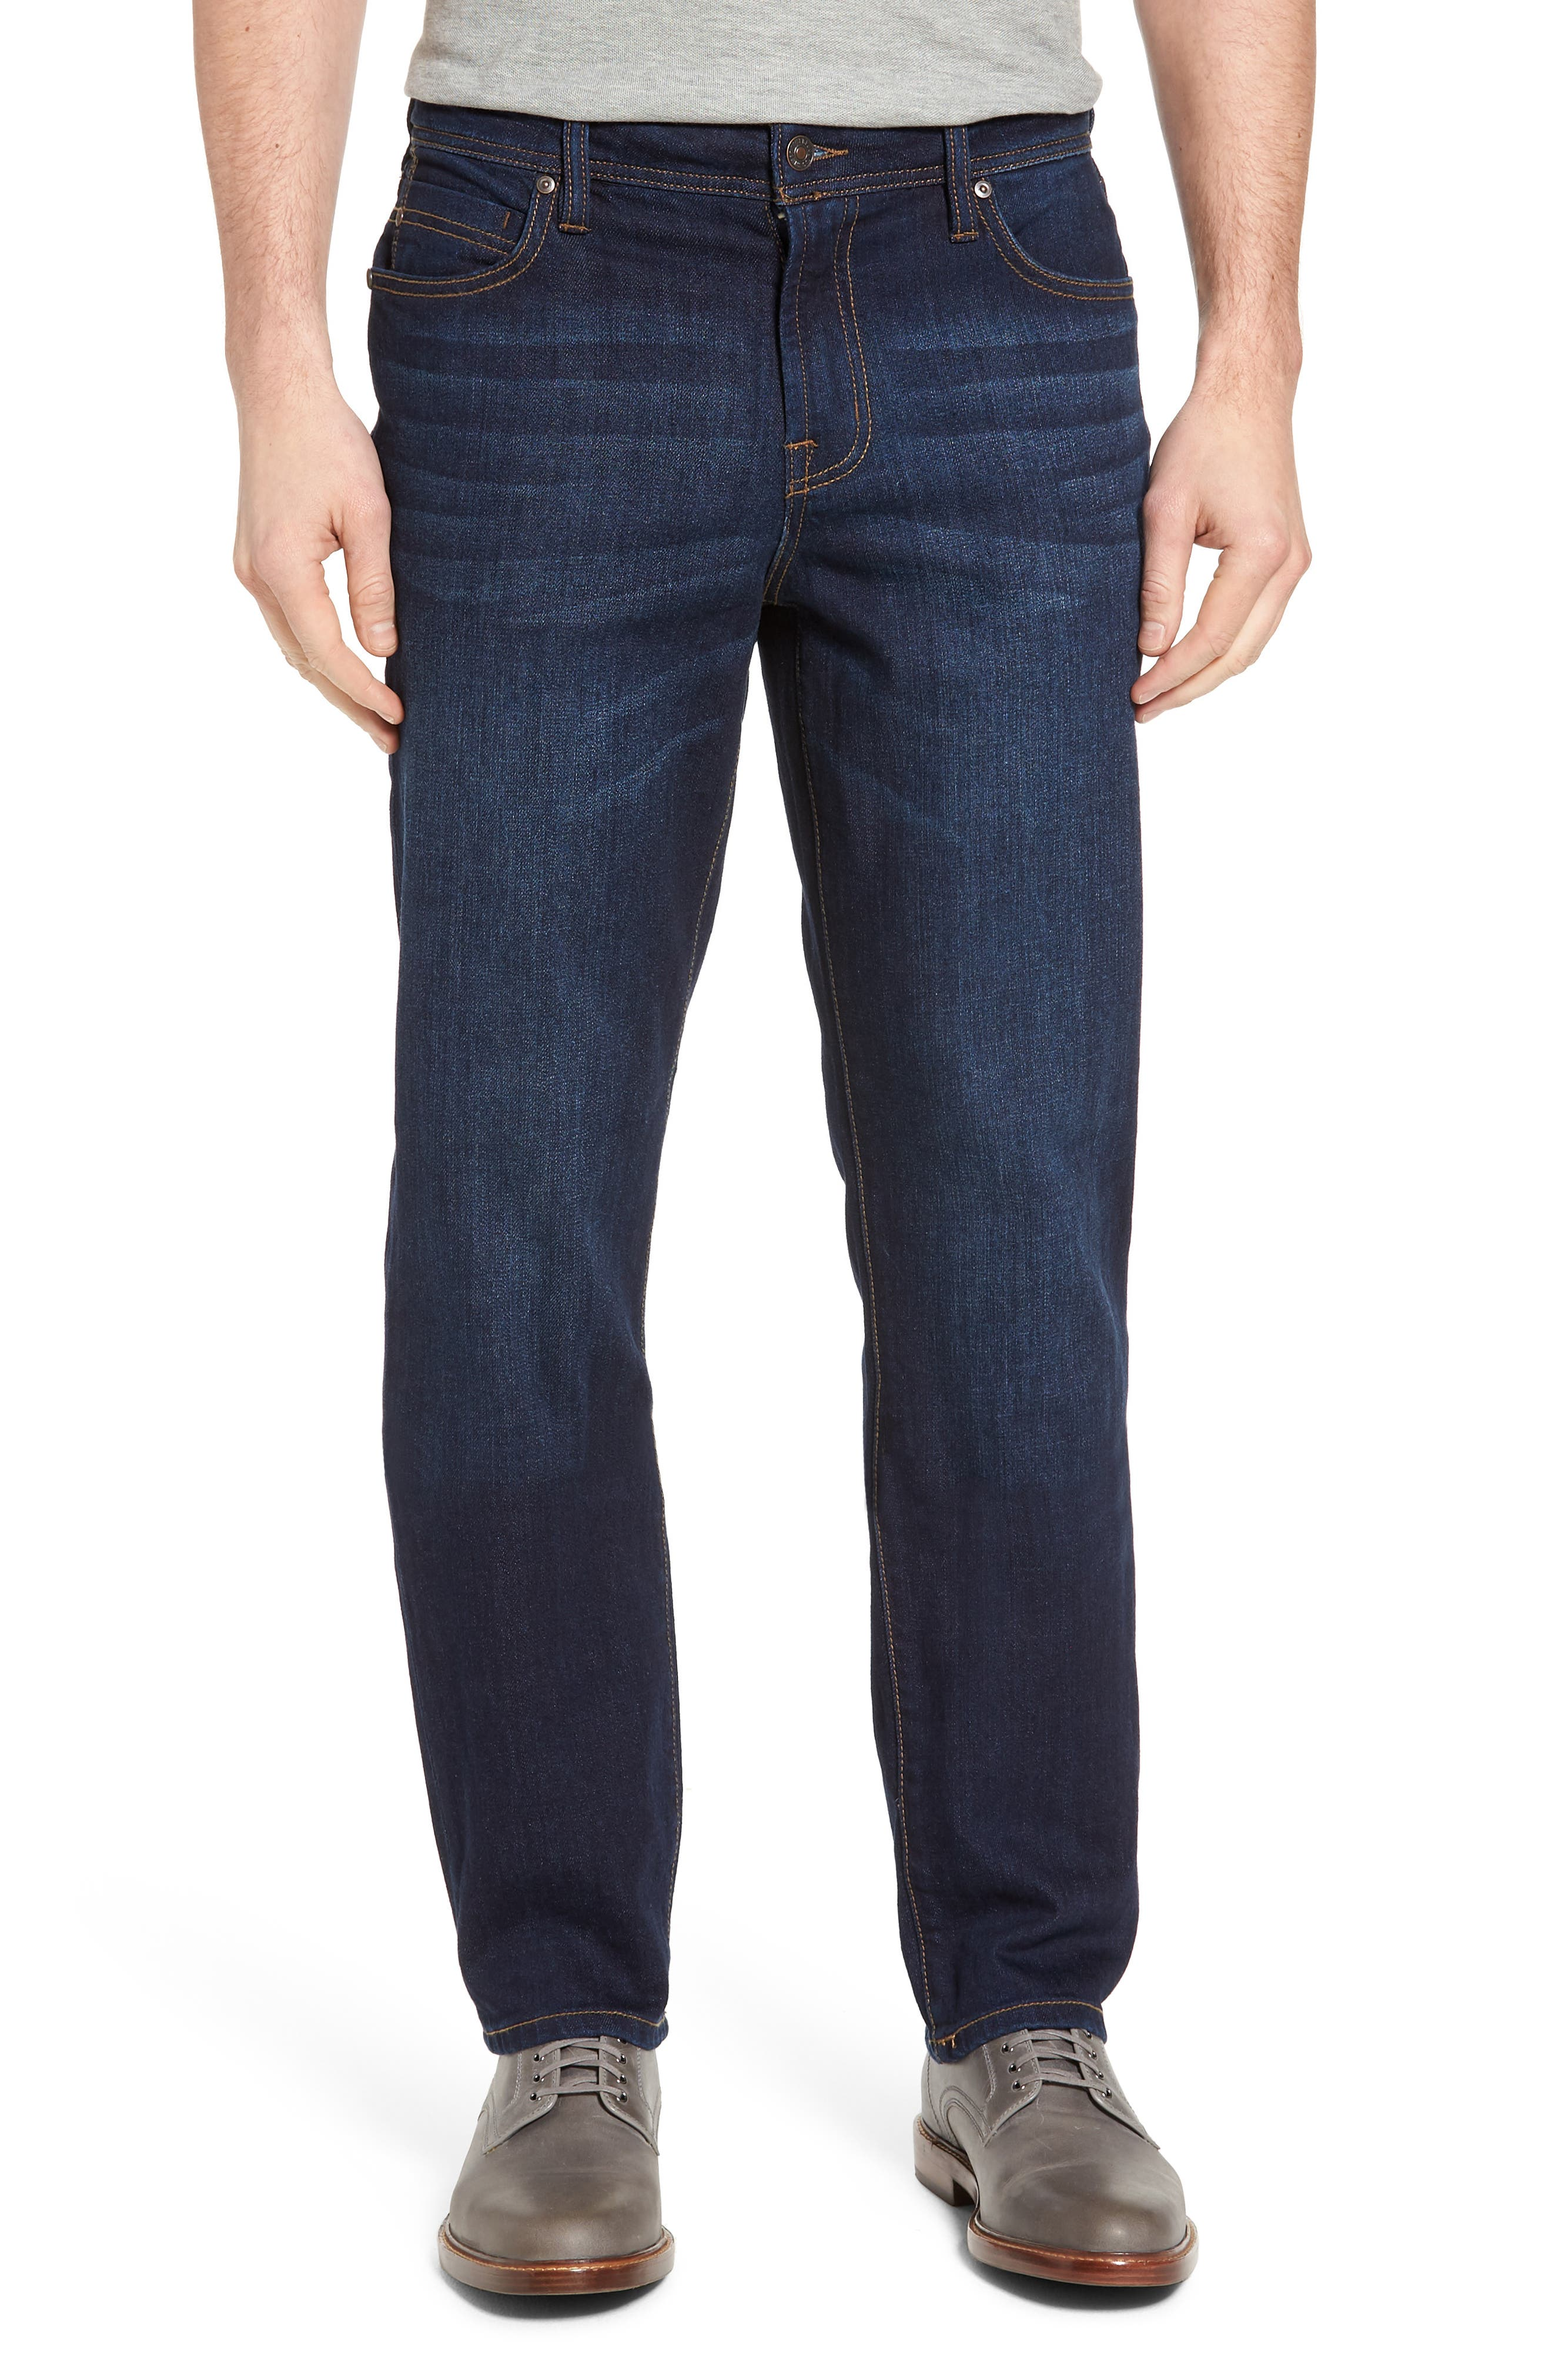 Jeans Co. Regent Relaxed Fit Jeans,                         Main,                         color, SAN ARDO VINTAGE DARK